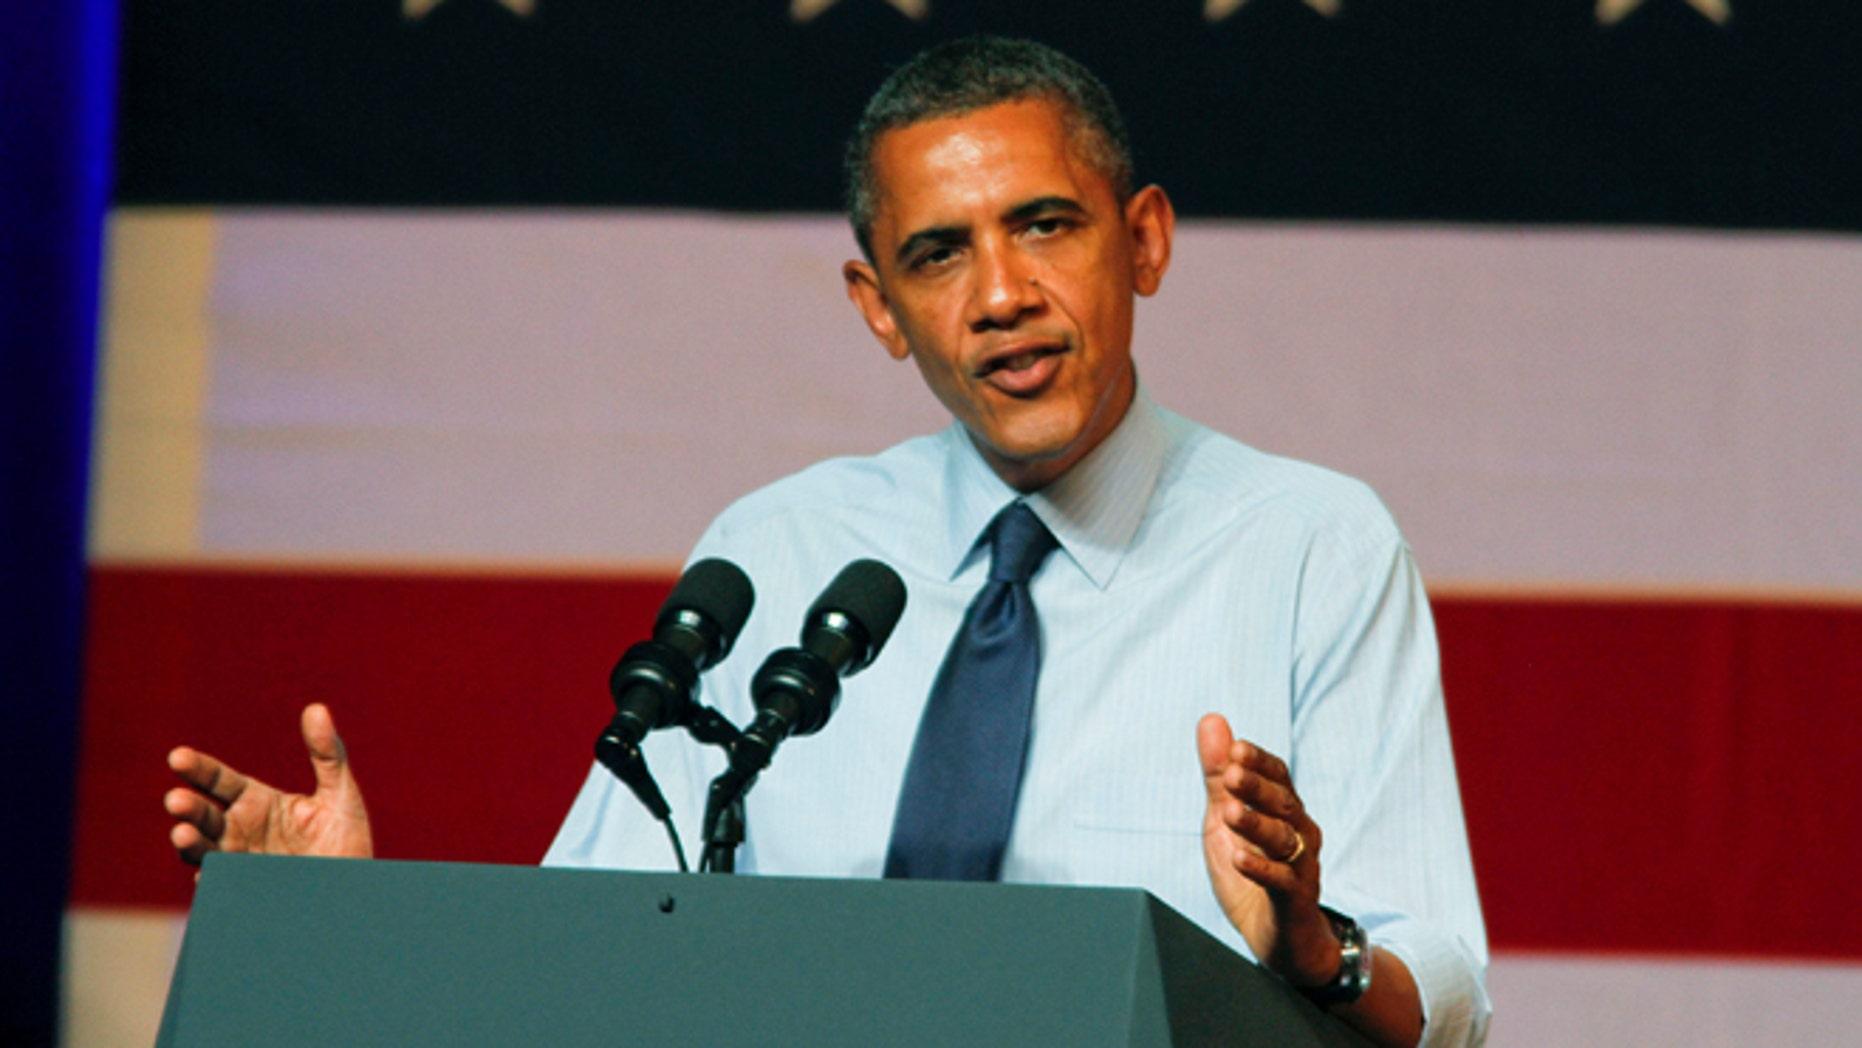 FILE: July 17, 2012: President Obama in Austin, Texas